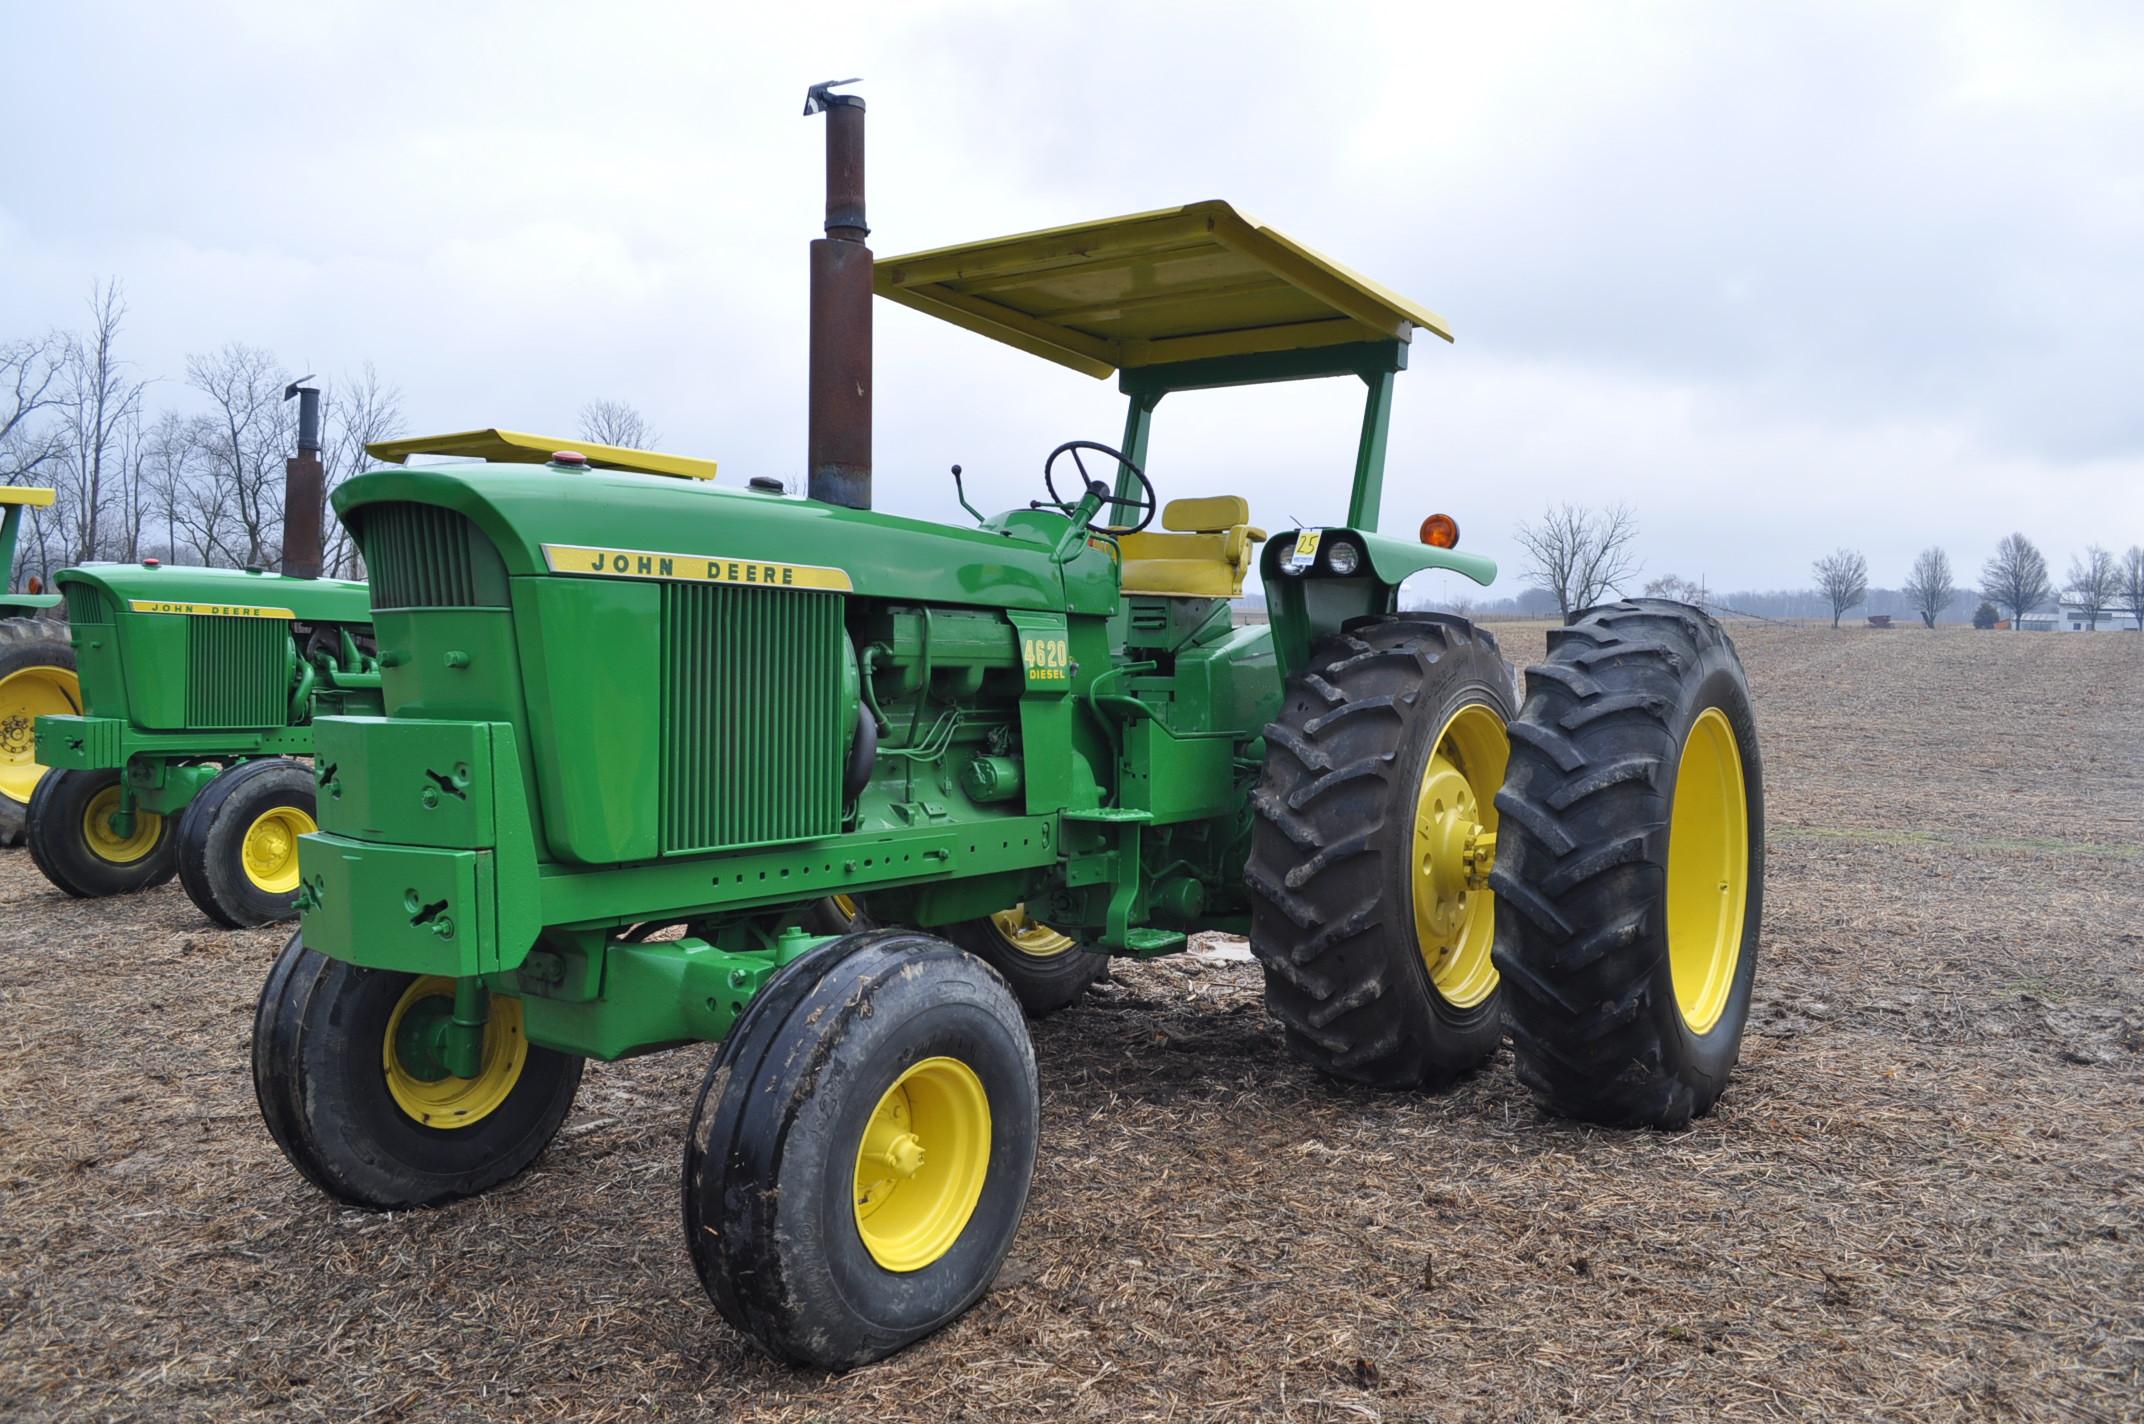 John Deere 4520 tractor, ***4520 frame with 4620 engine**** diesel, 18.4-38 new inside rear